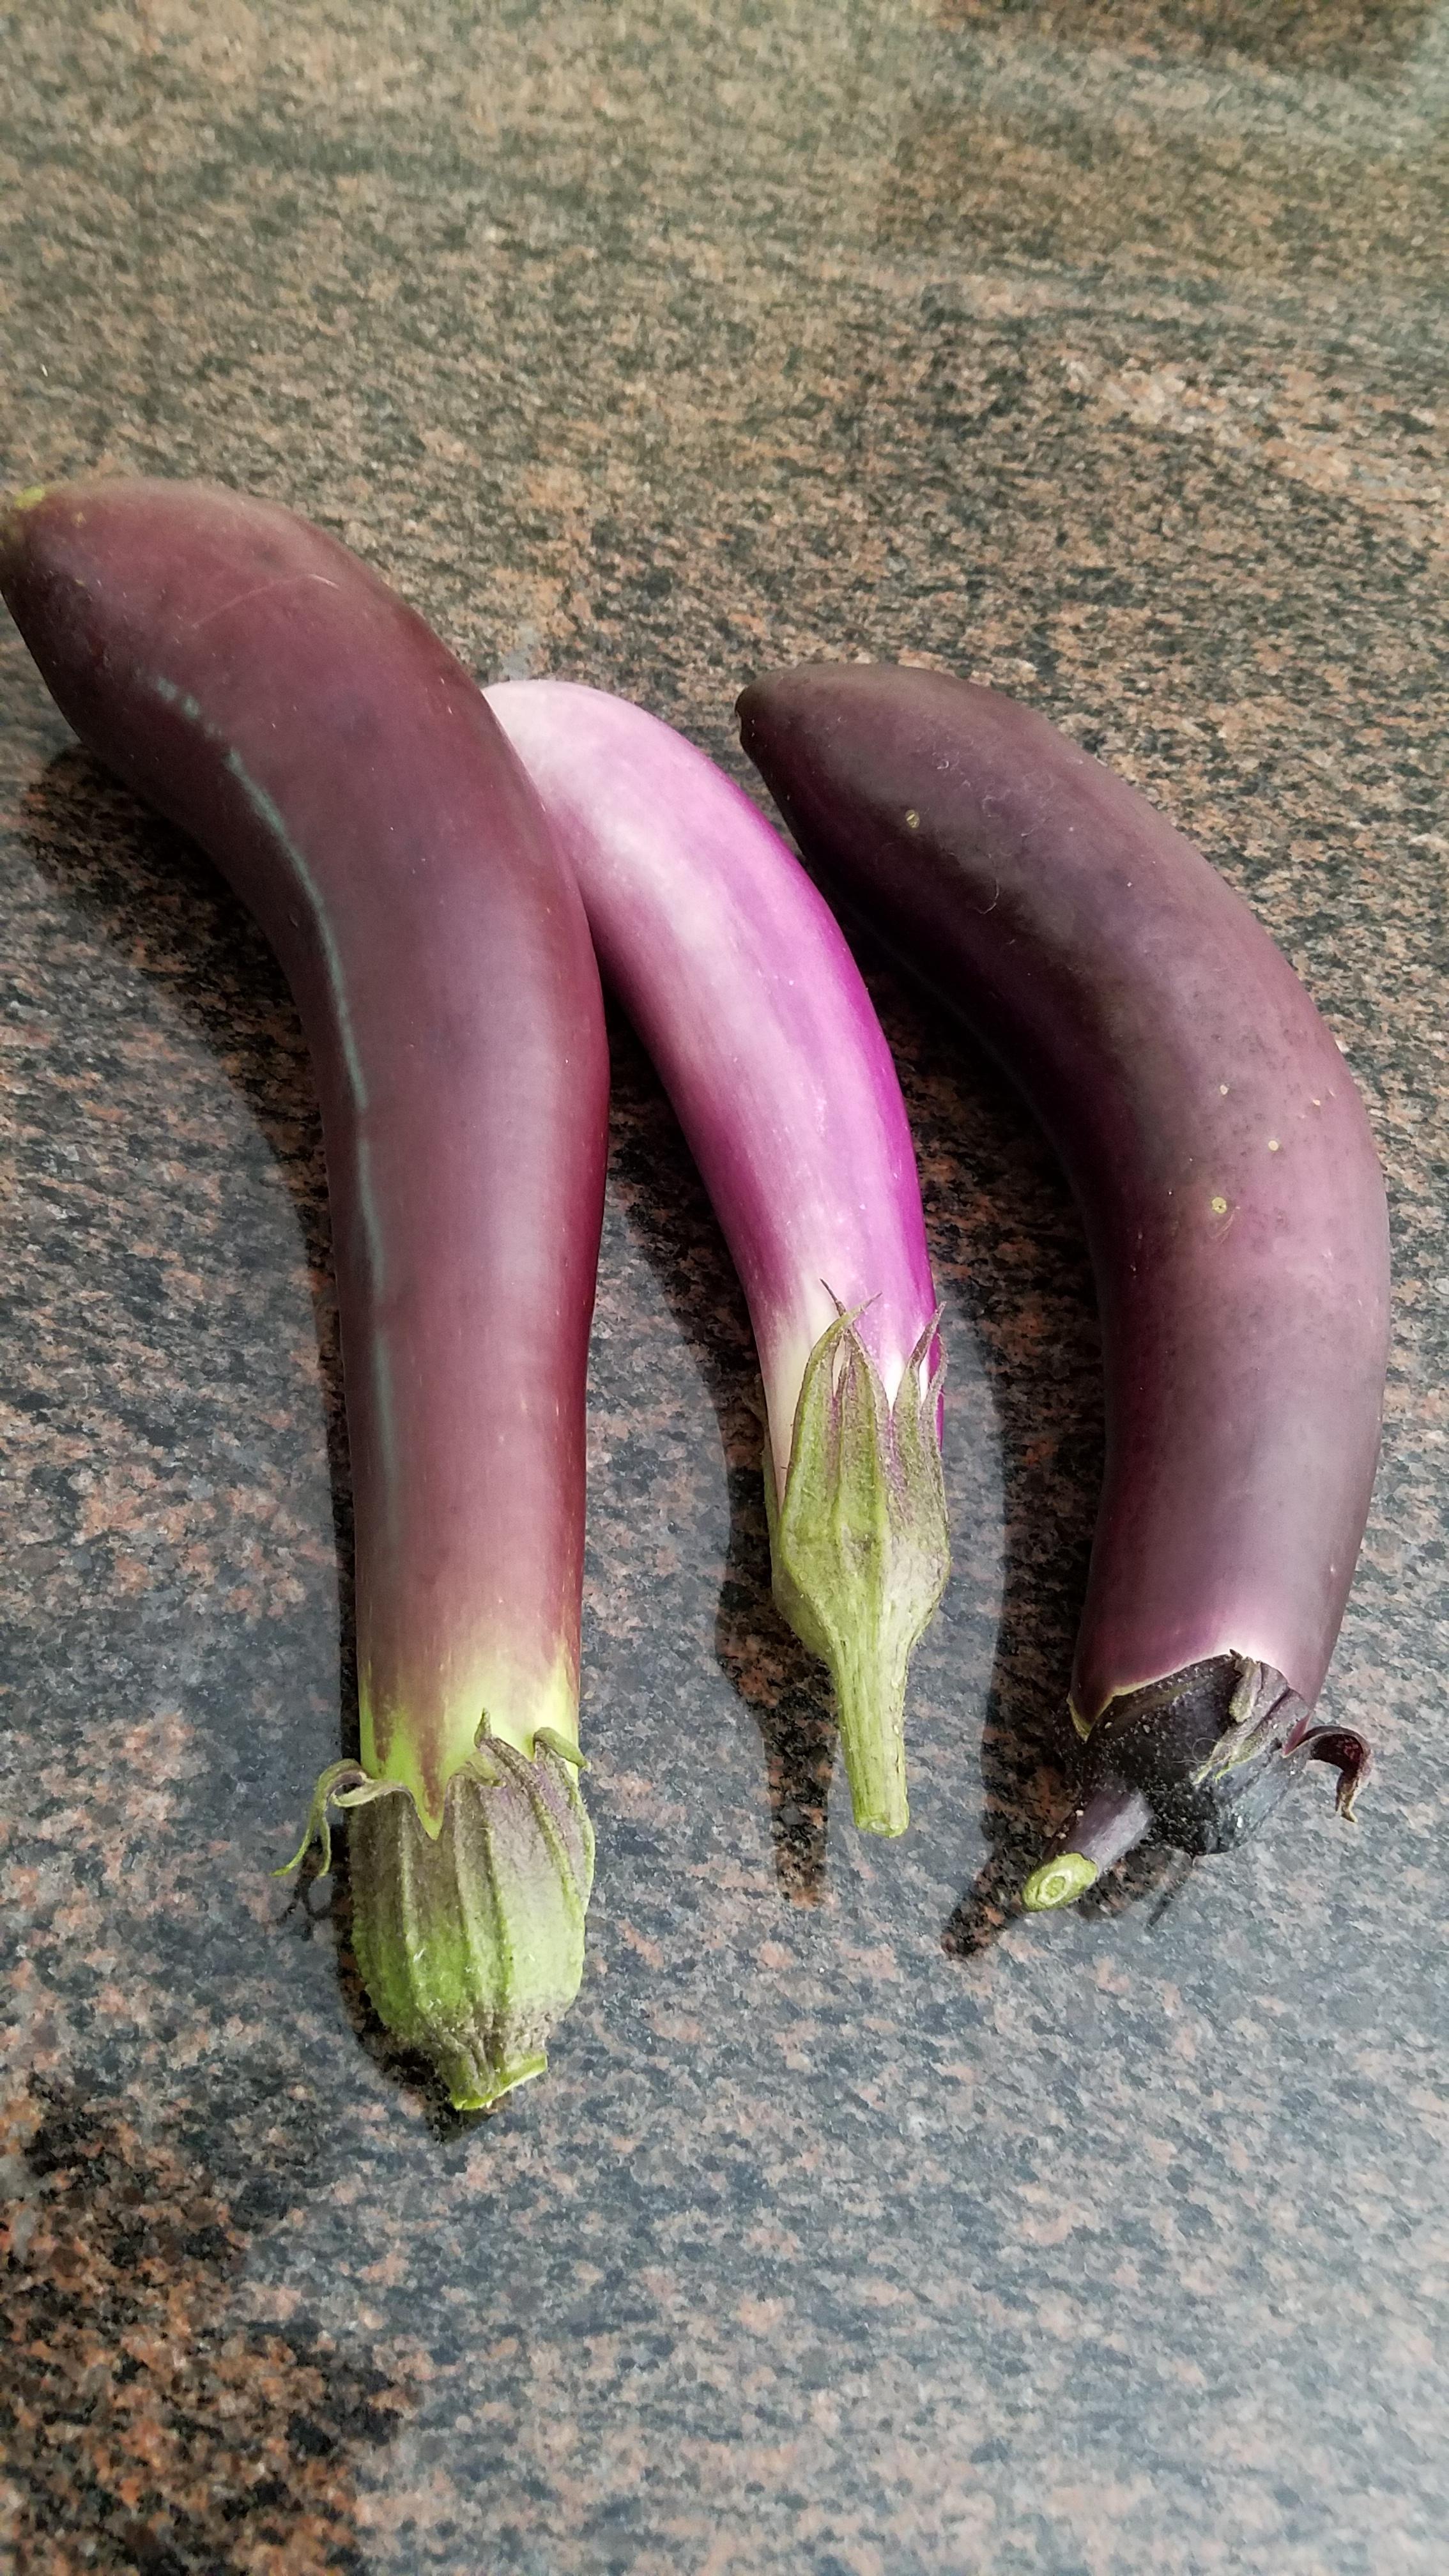 Eggplant compare July 18 2017.jpg